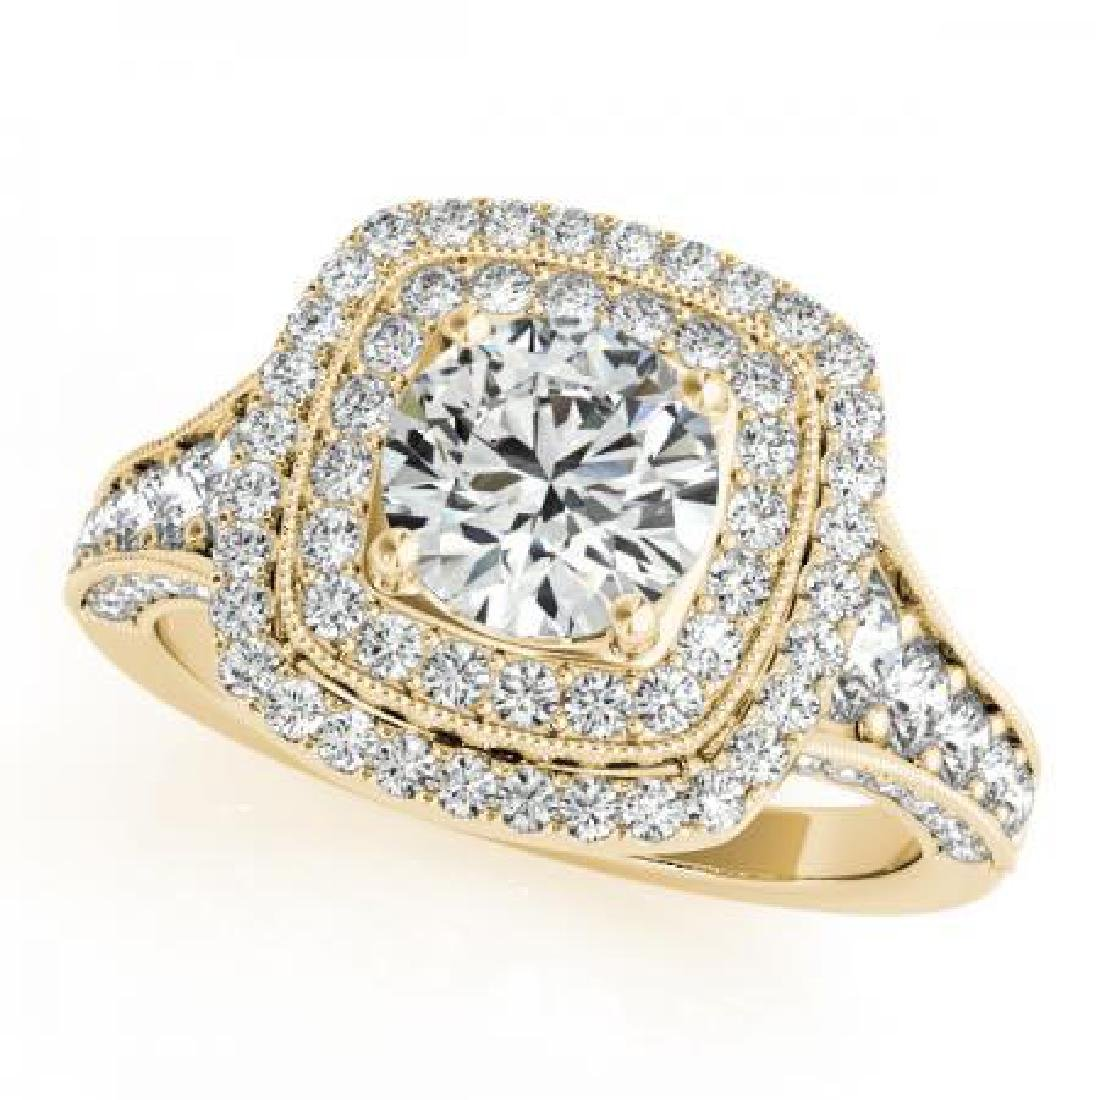 CERTIFIED 18K YELLOW GOLD 1.53 CT G-H/VS-SI1 DIAMOND HA